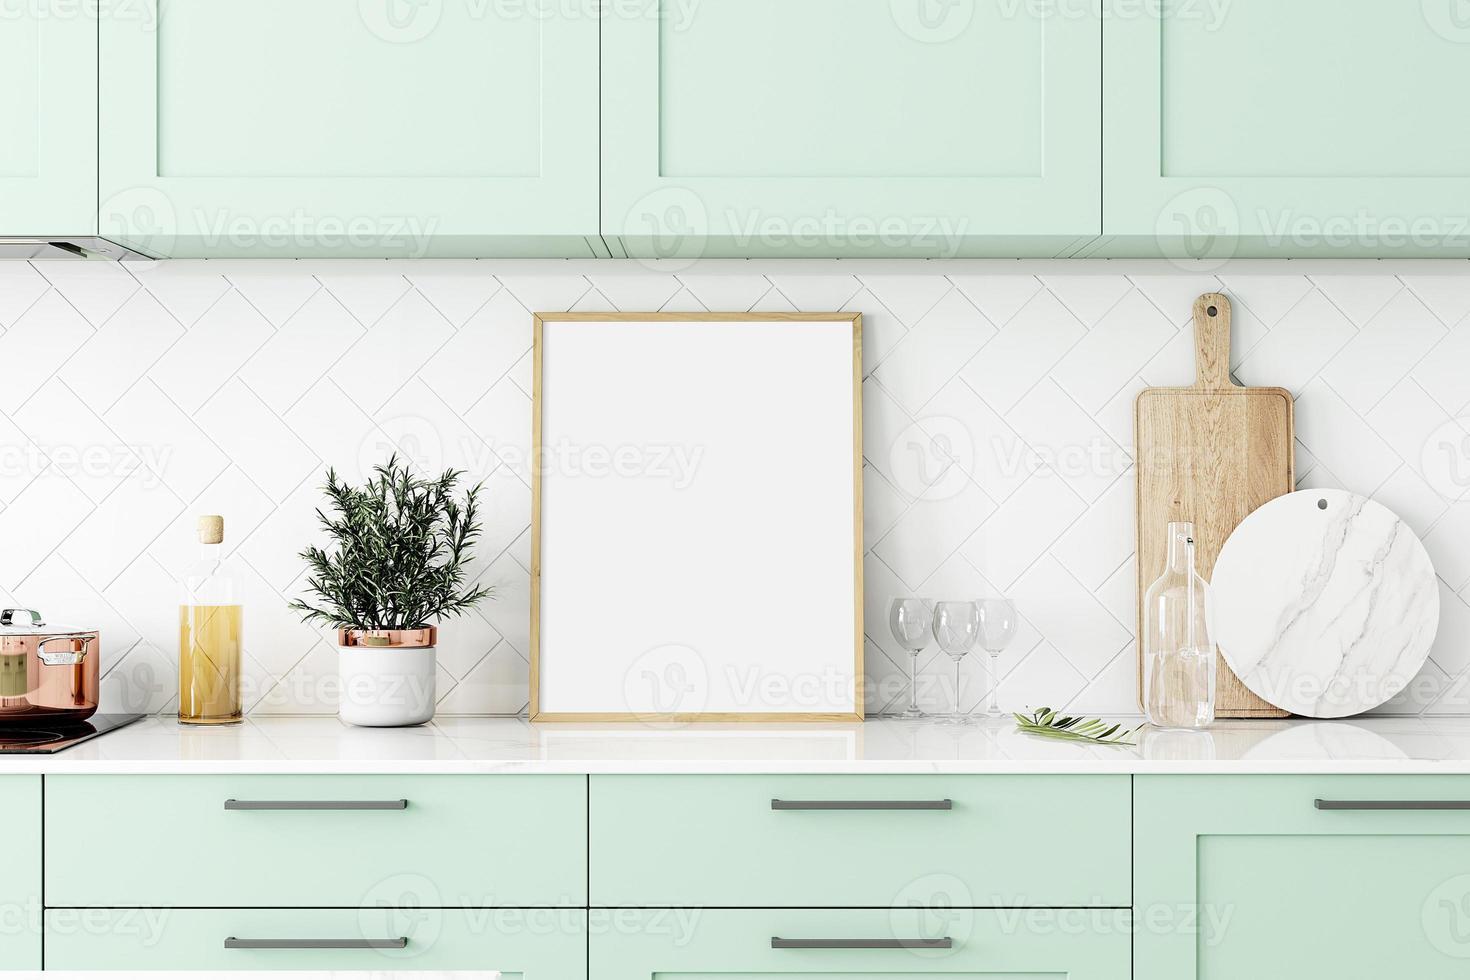 keukenframe mockup foto